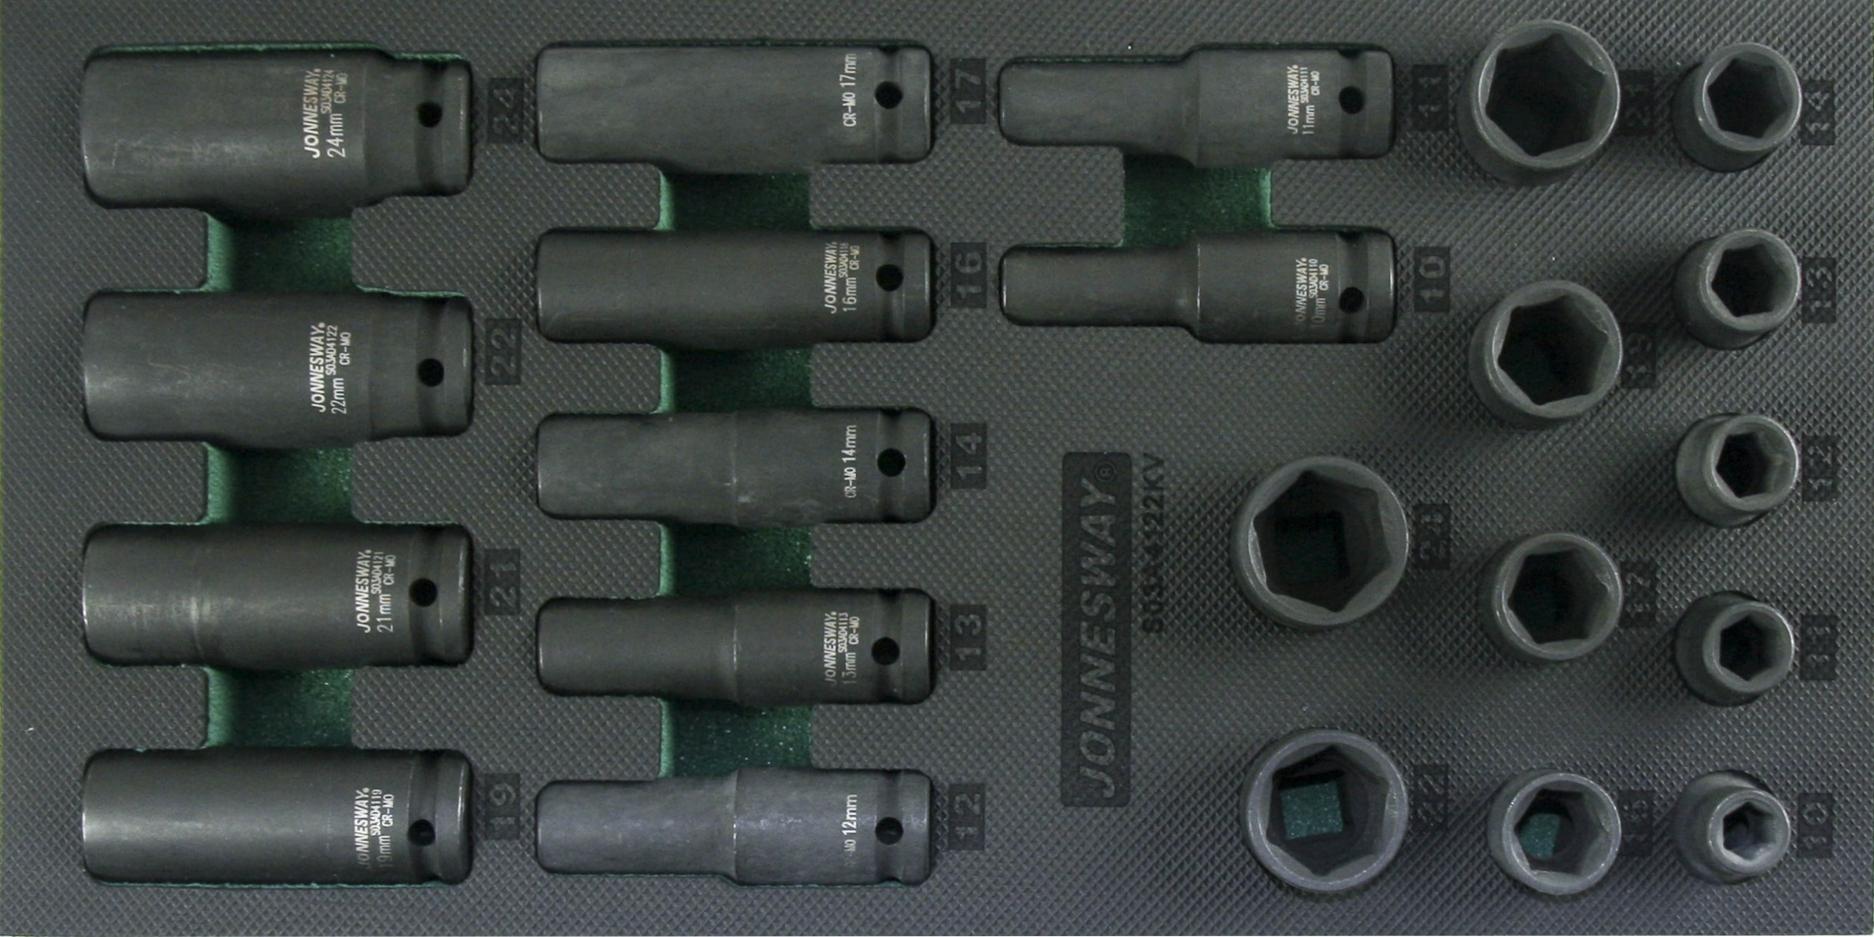 "Modul pěnový - hlavice úderové 1/2"", 10 - 24 mm, 6hranné, 22 ks - JONNESWAY S03A4122KV"